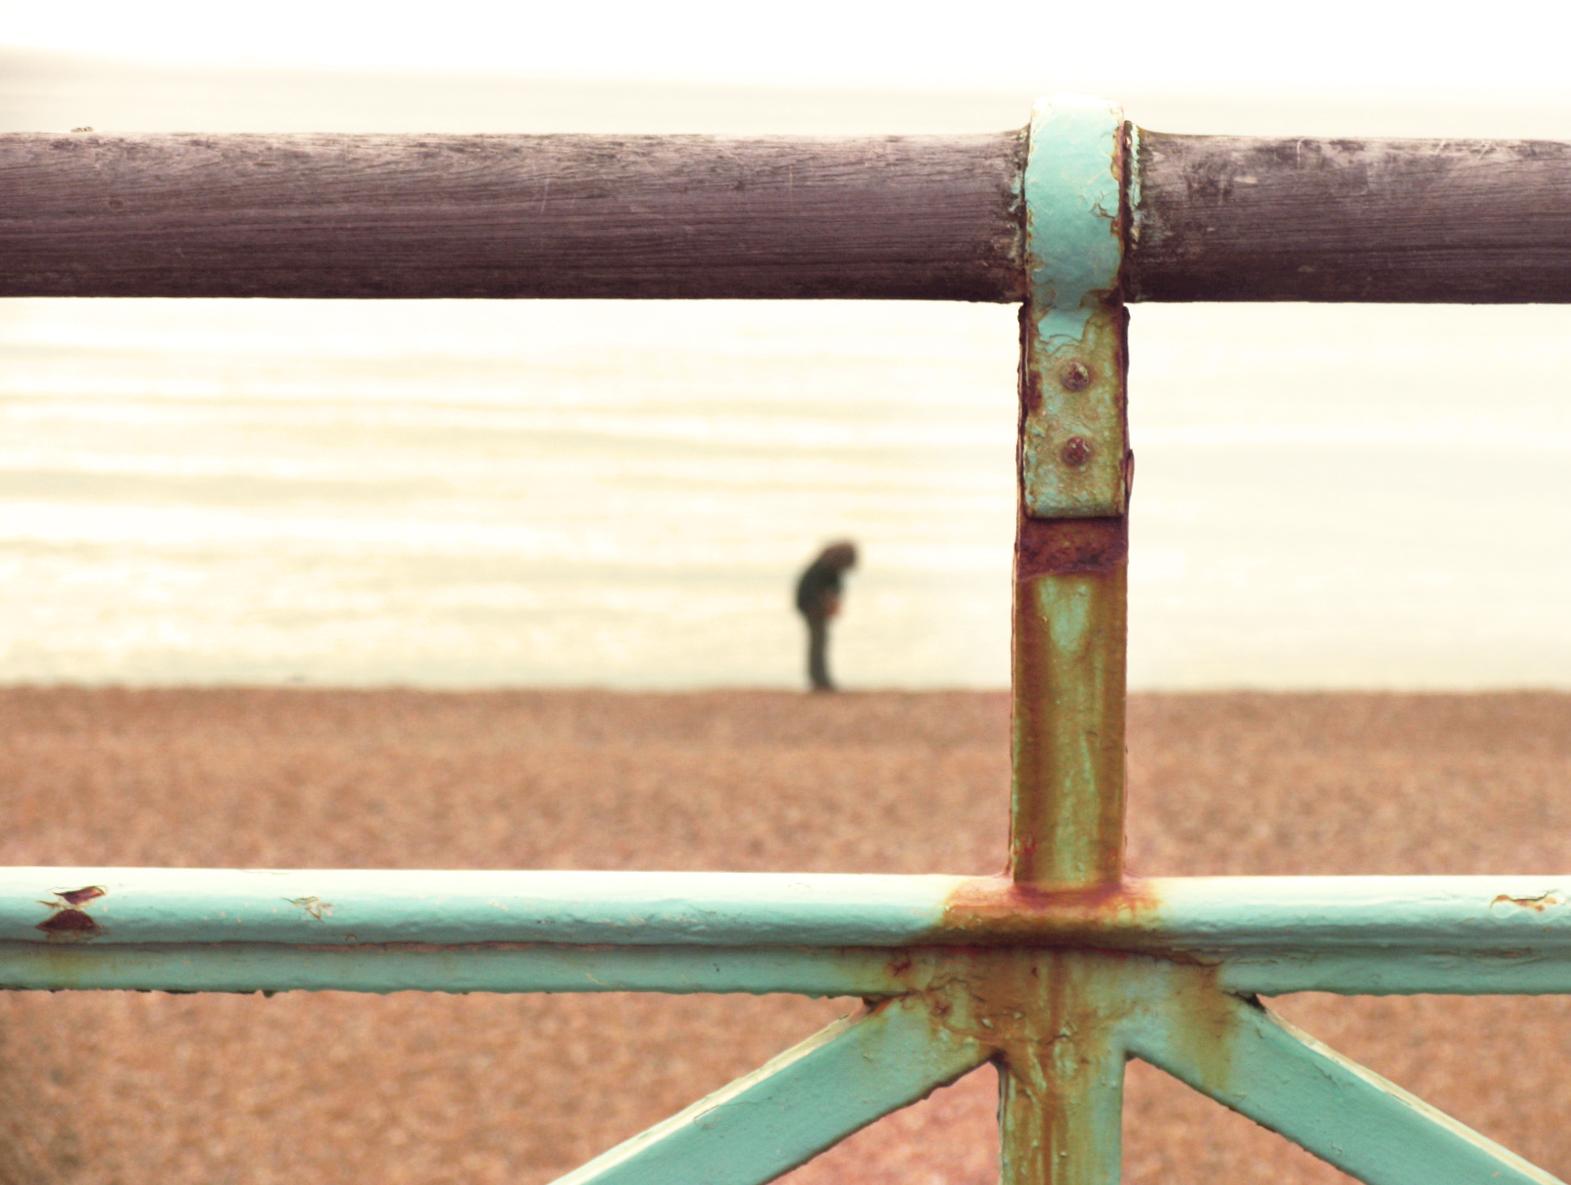 Fence, Rust, Sand, Metal, Beach, HQ Photo